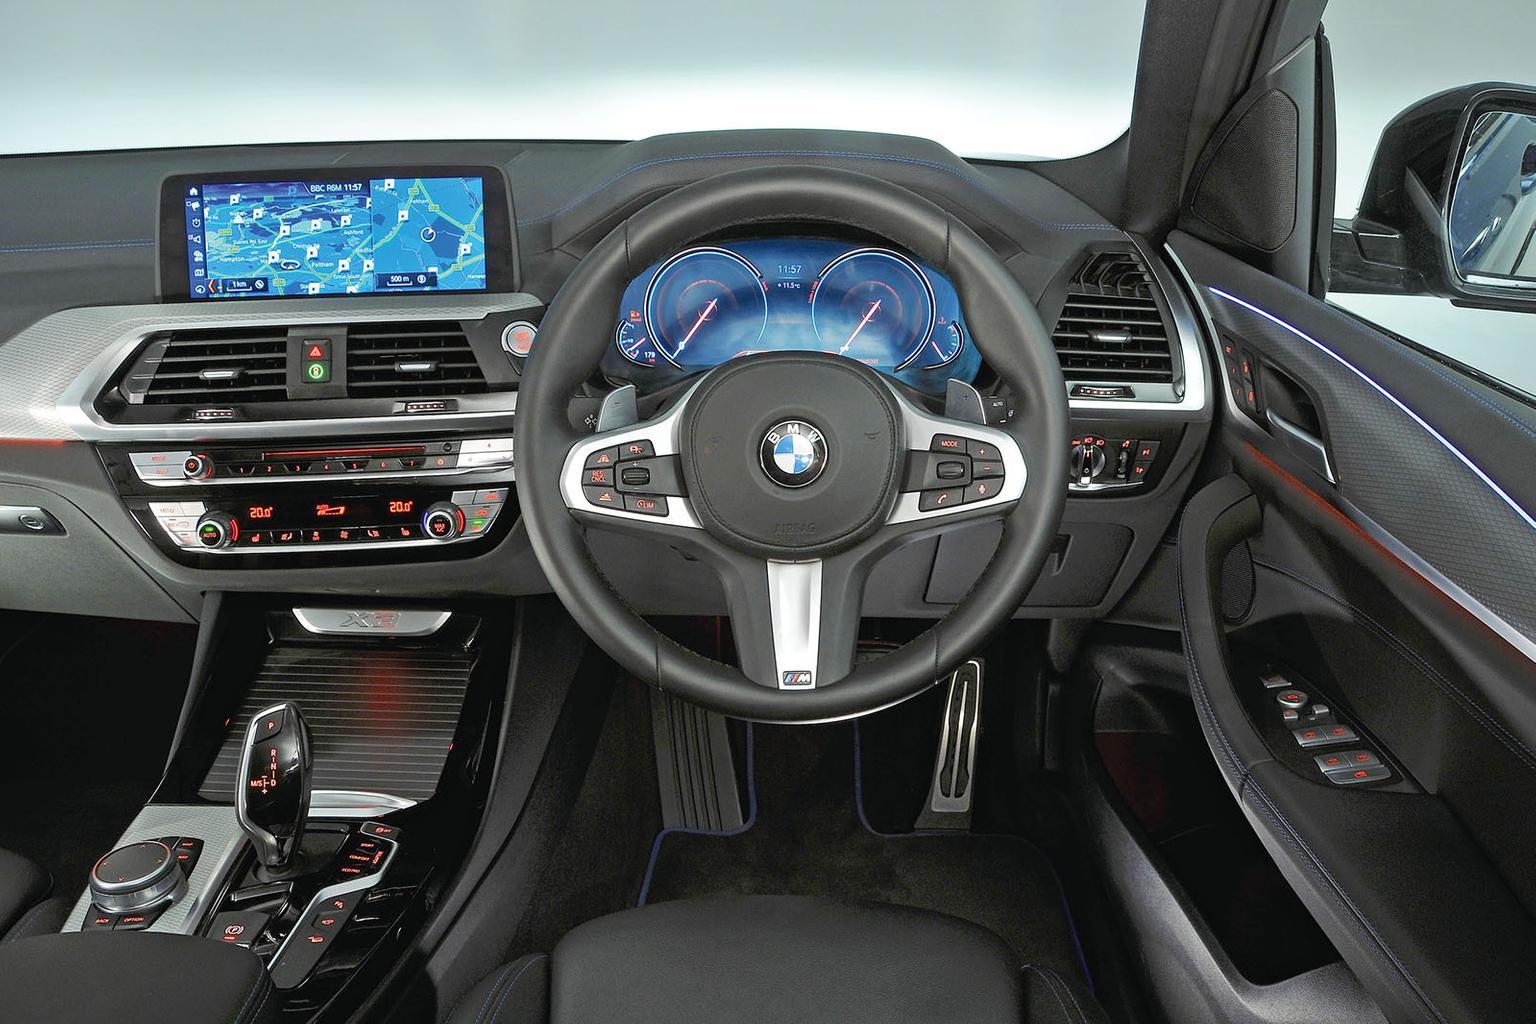 New BMW X3 vs Audi Q5 vs Land Rover Discovery Sport